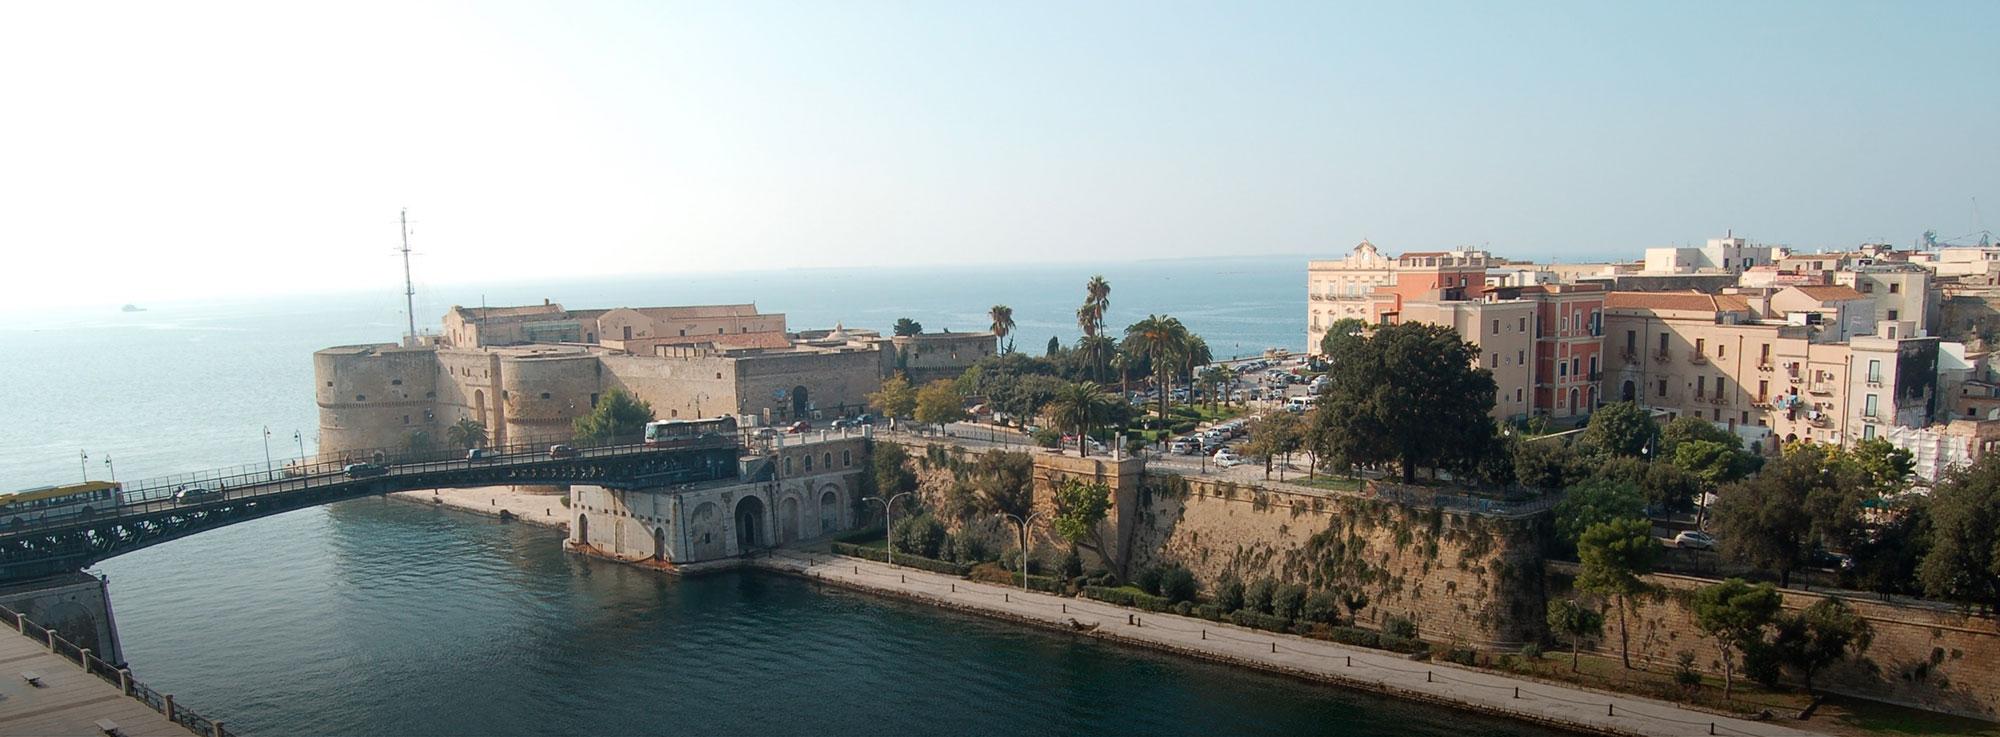 Taranto: Heroes